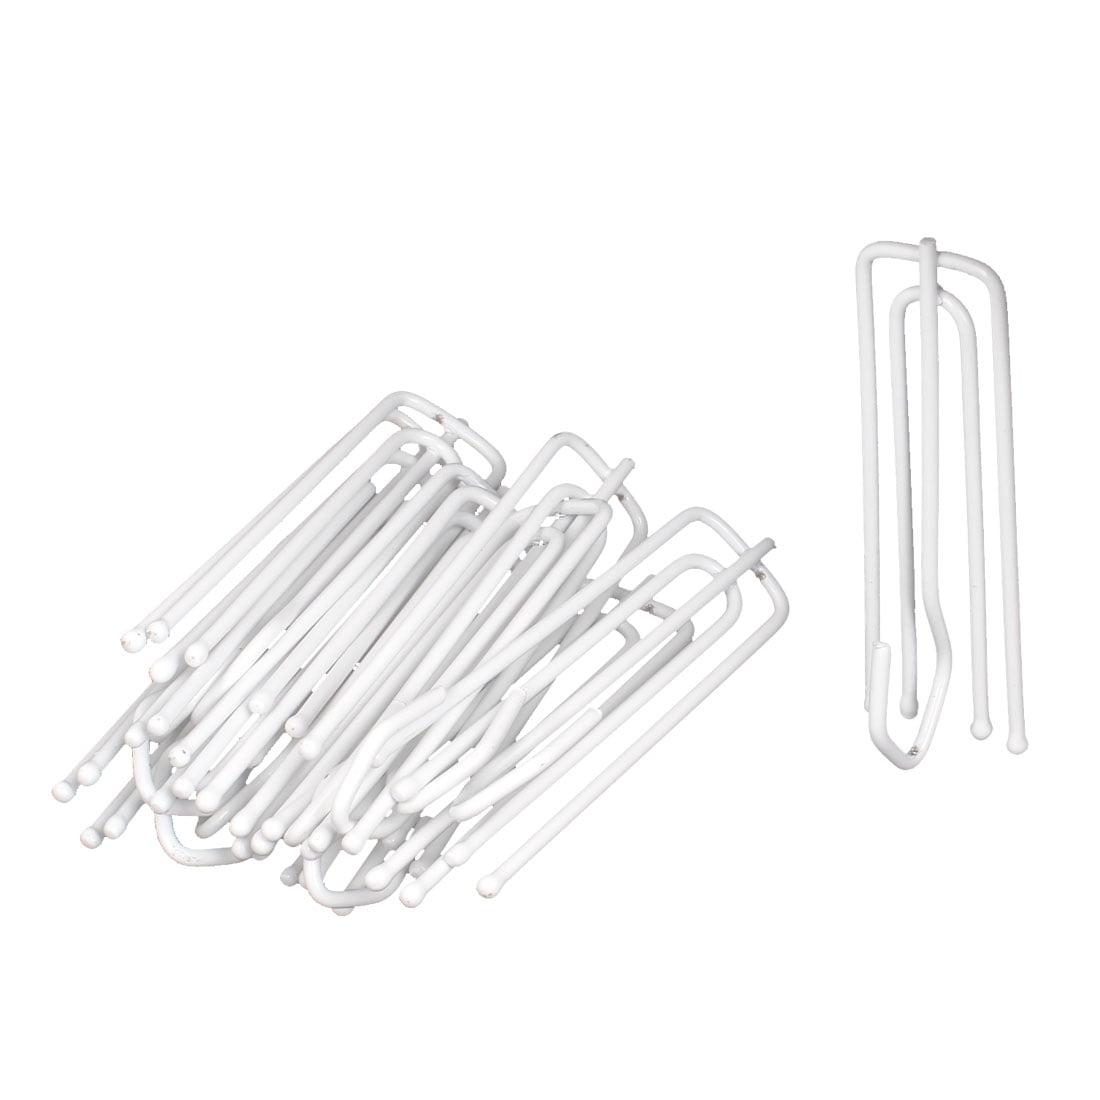 72mm Long White Metal 4 Prongs Pinch Pleat Drapes Curtain